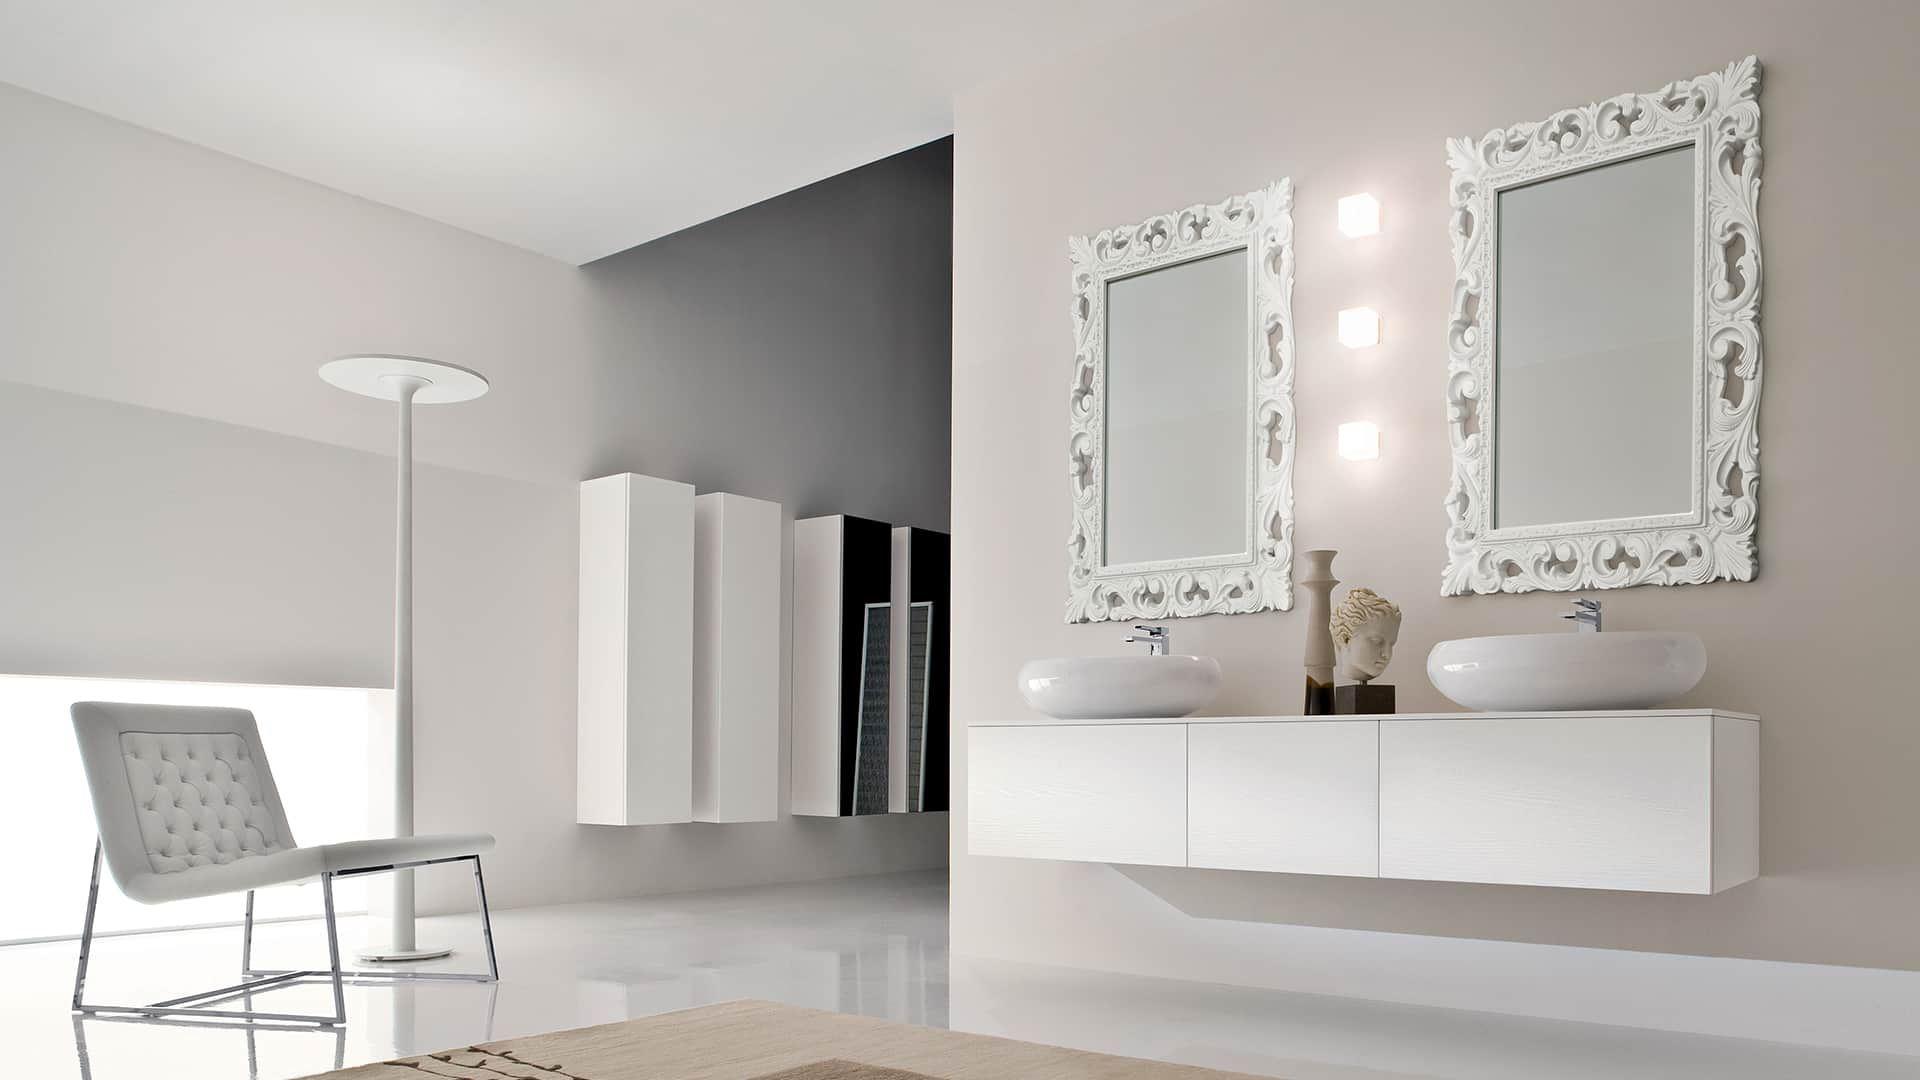 Mobili bagno padova cool bagno mobili bagno offerte for Mobili gratis a milano